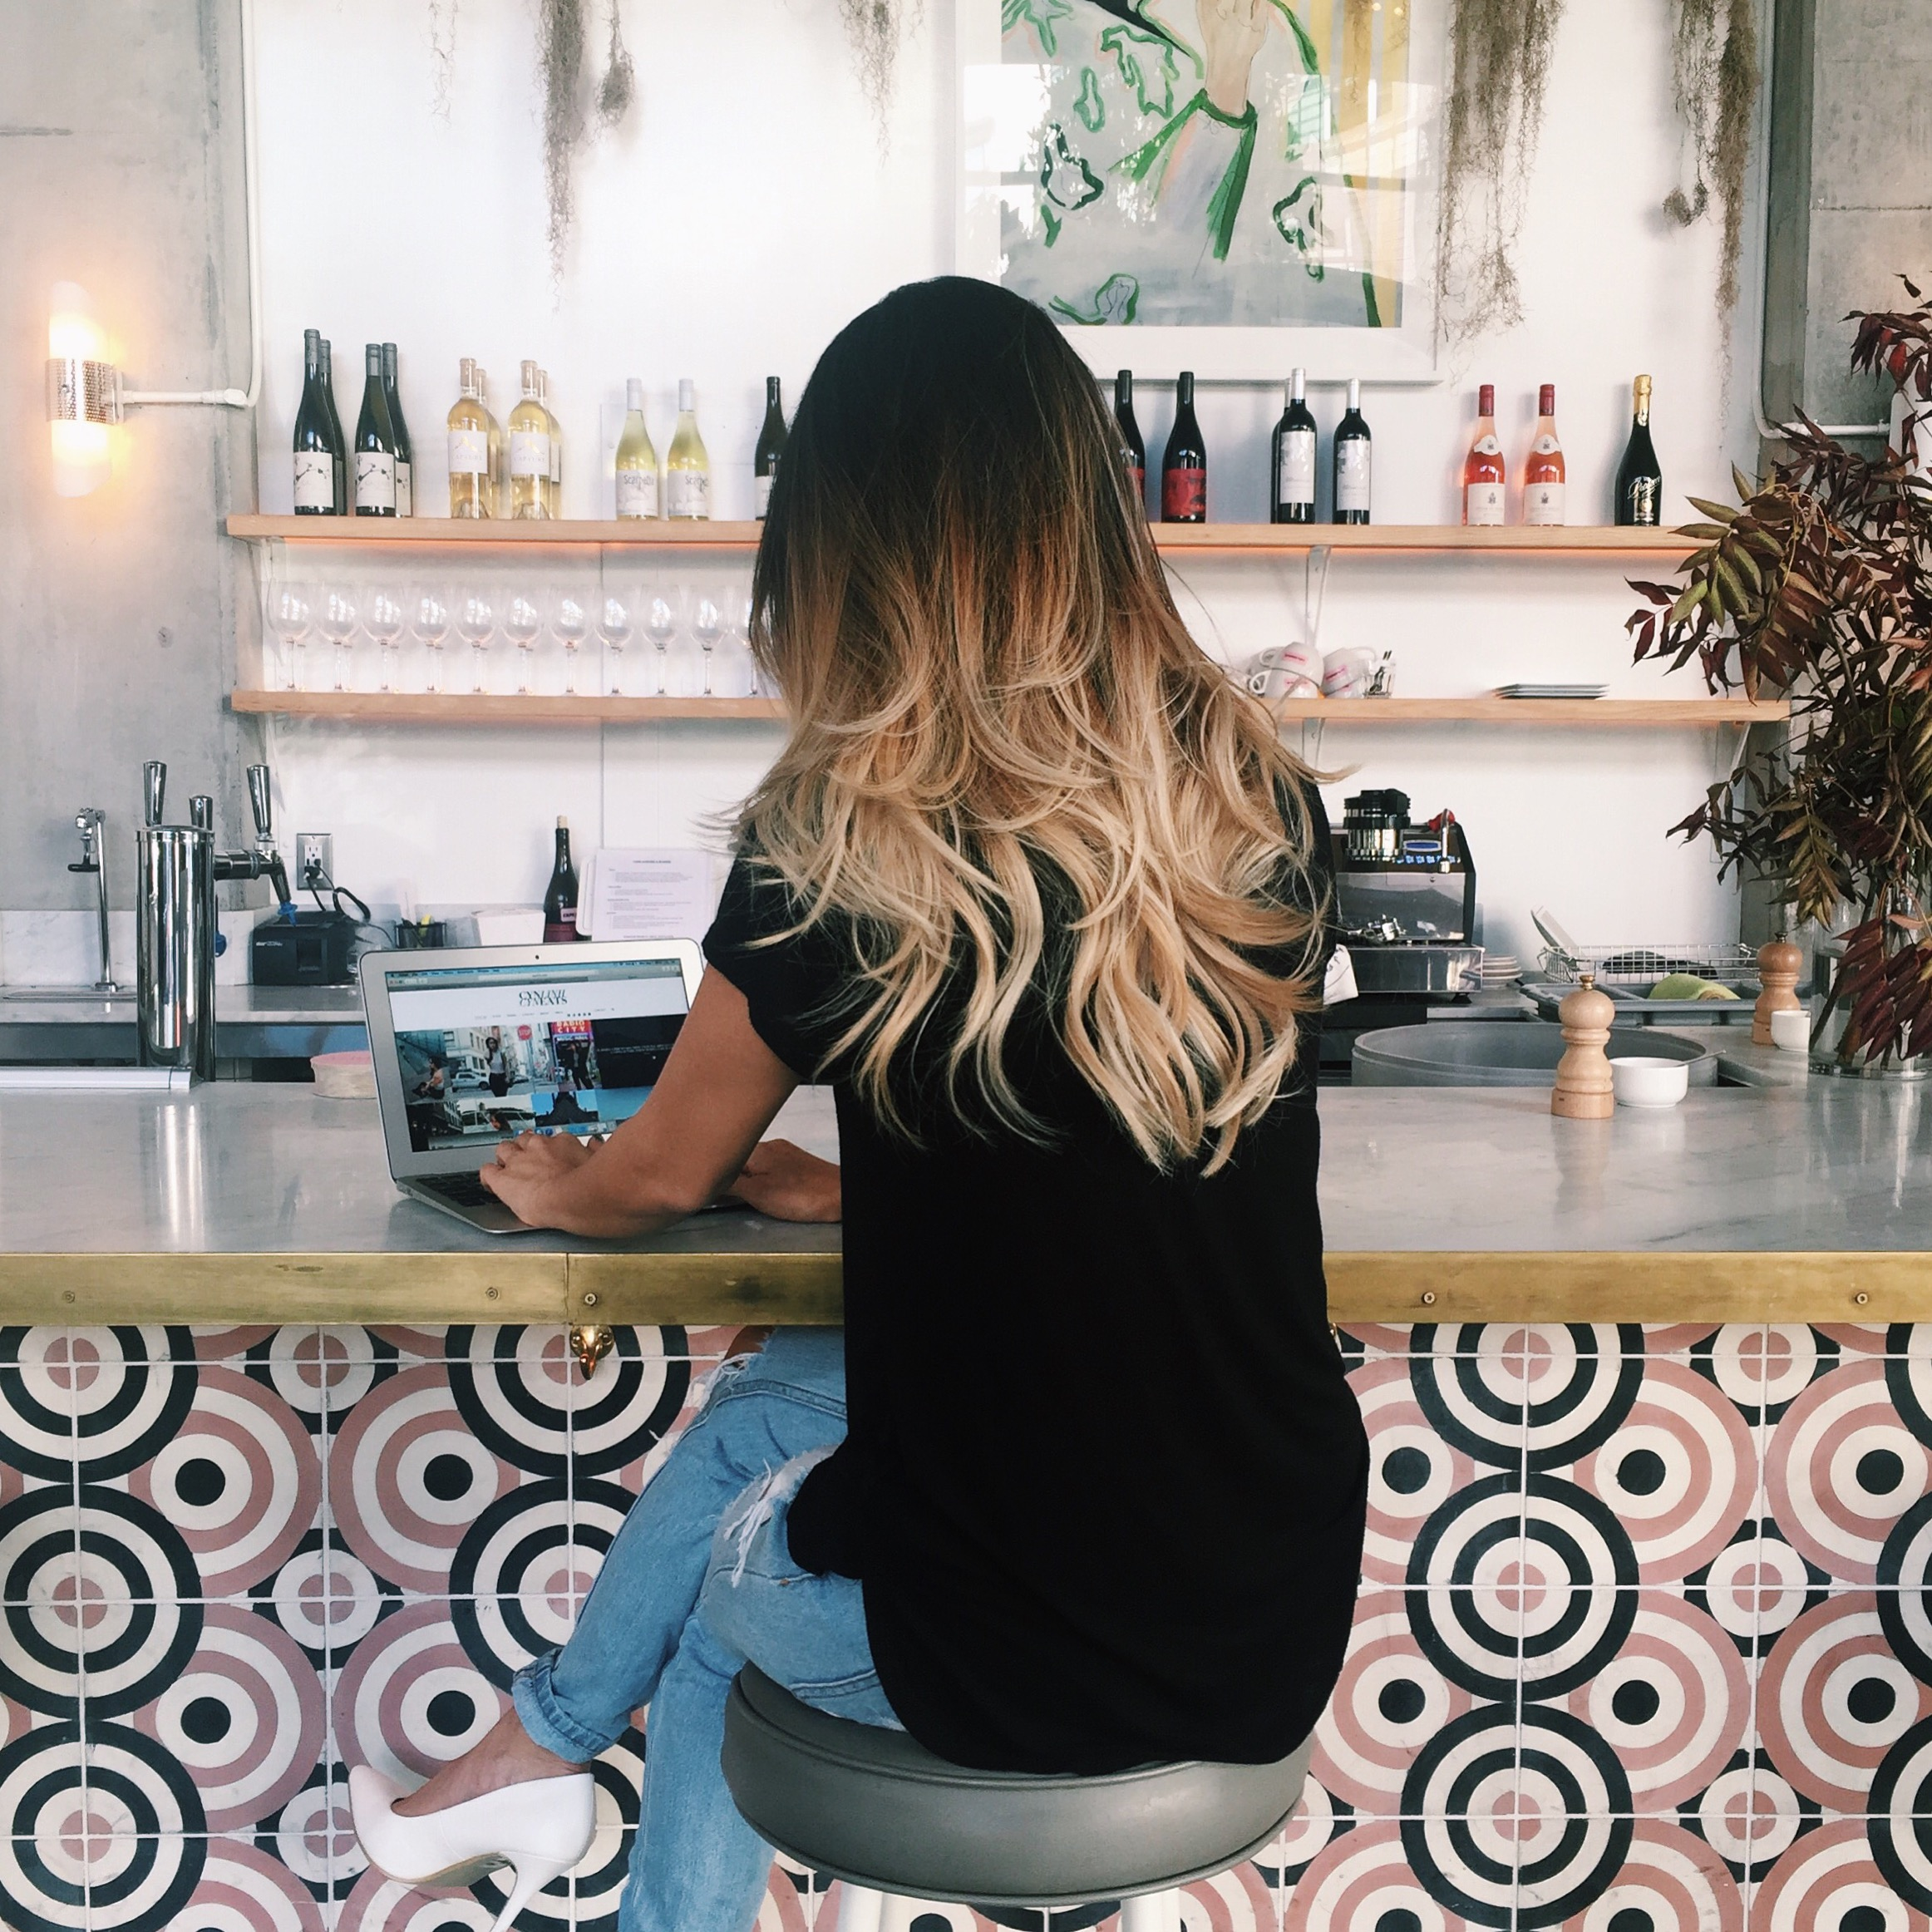 Cafe Reveille